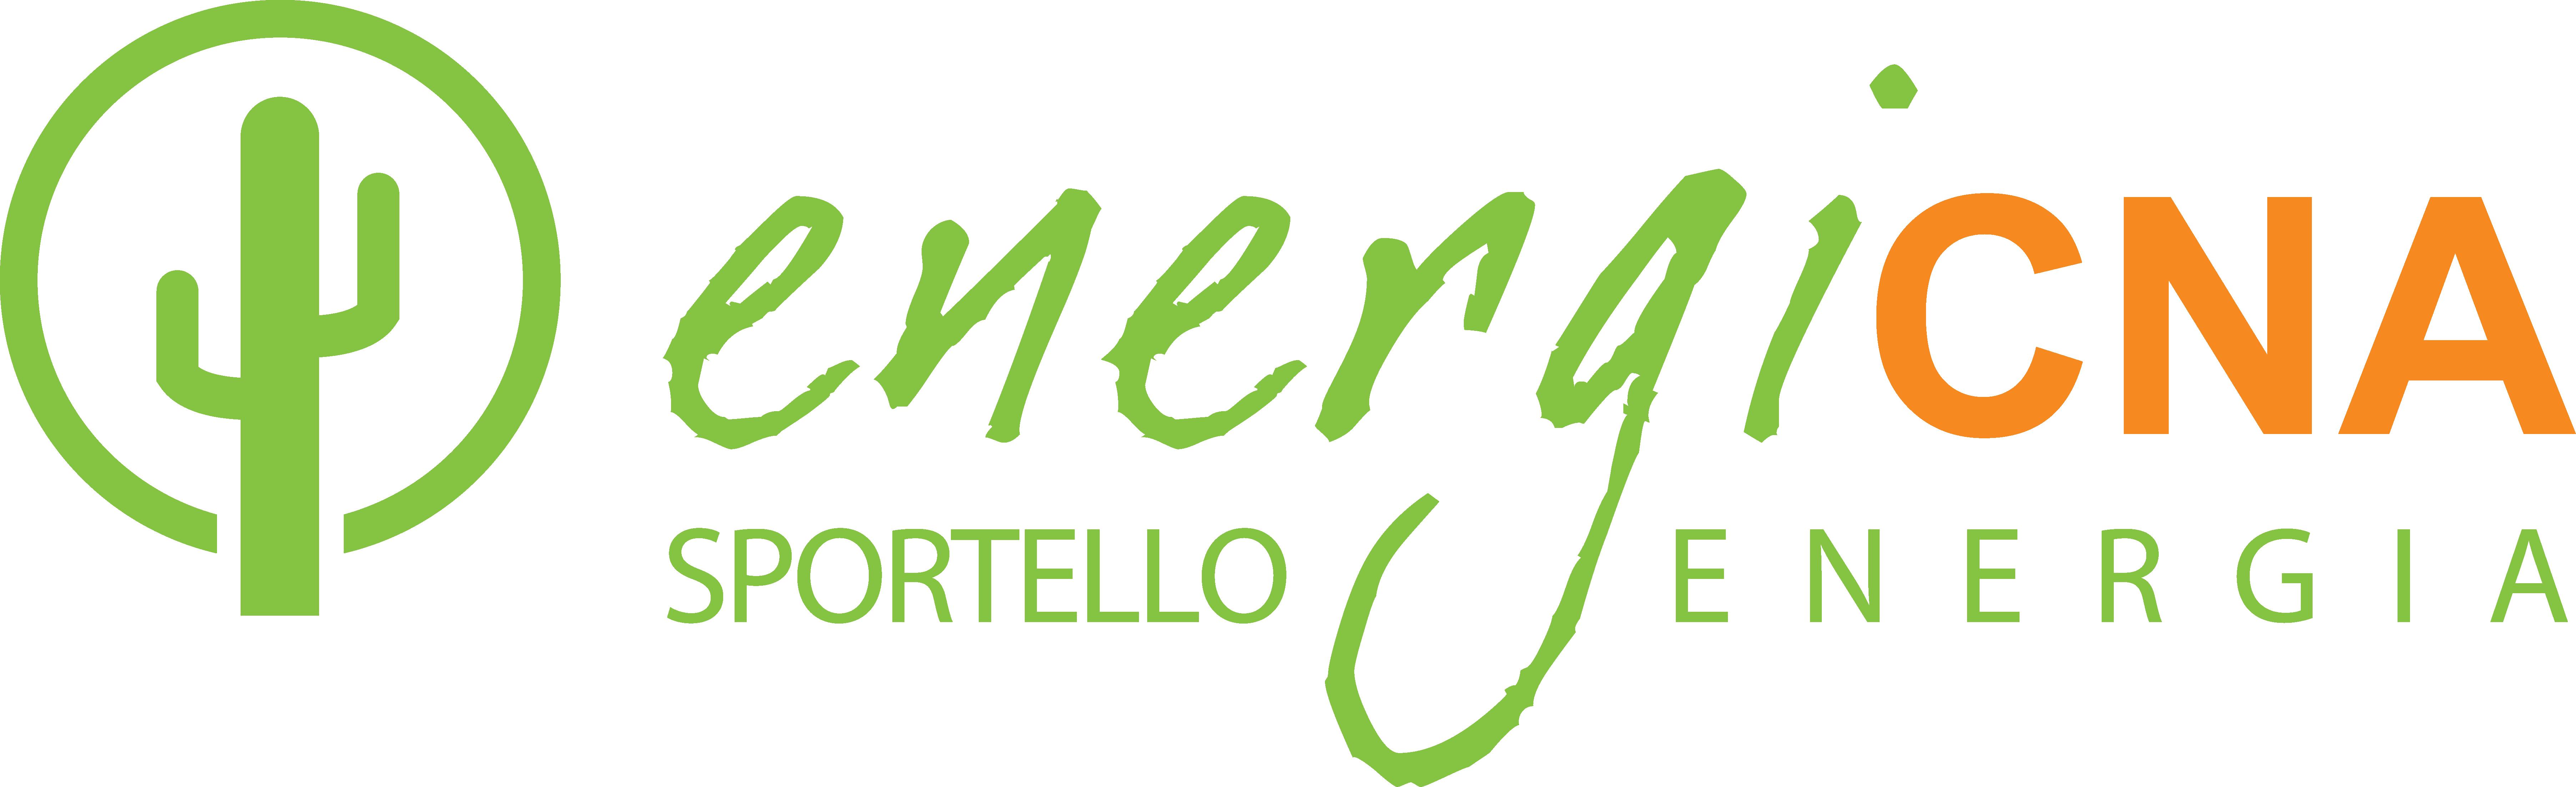 logo energicna sportelloenergia 1